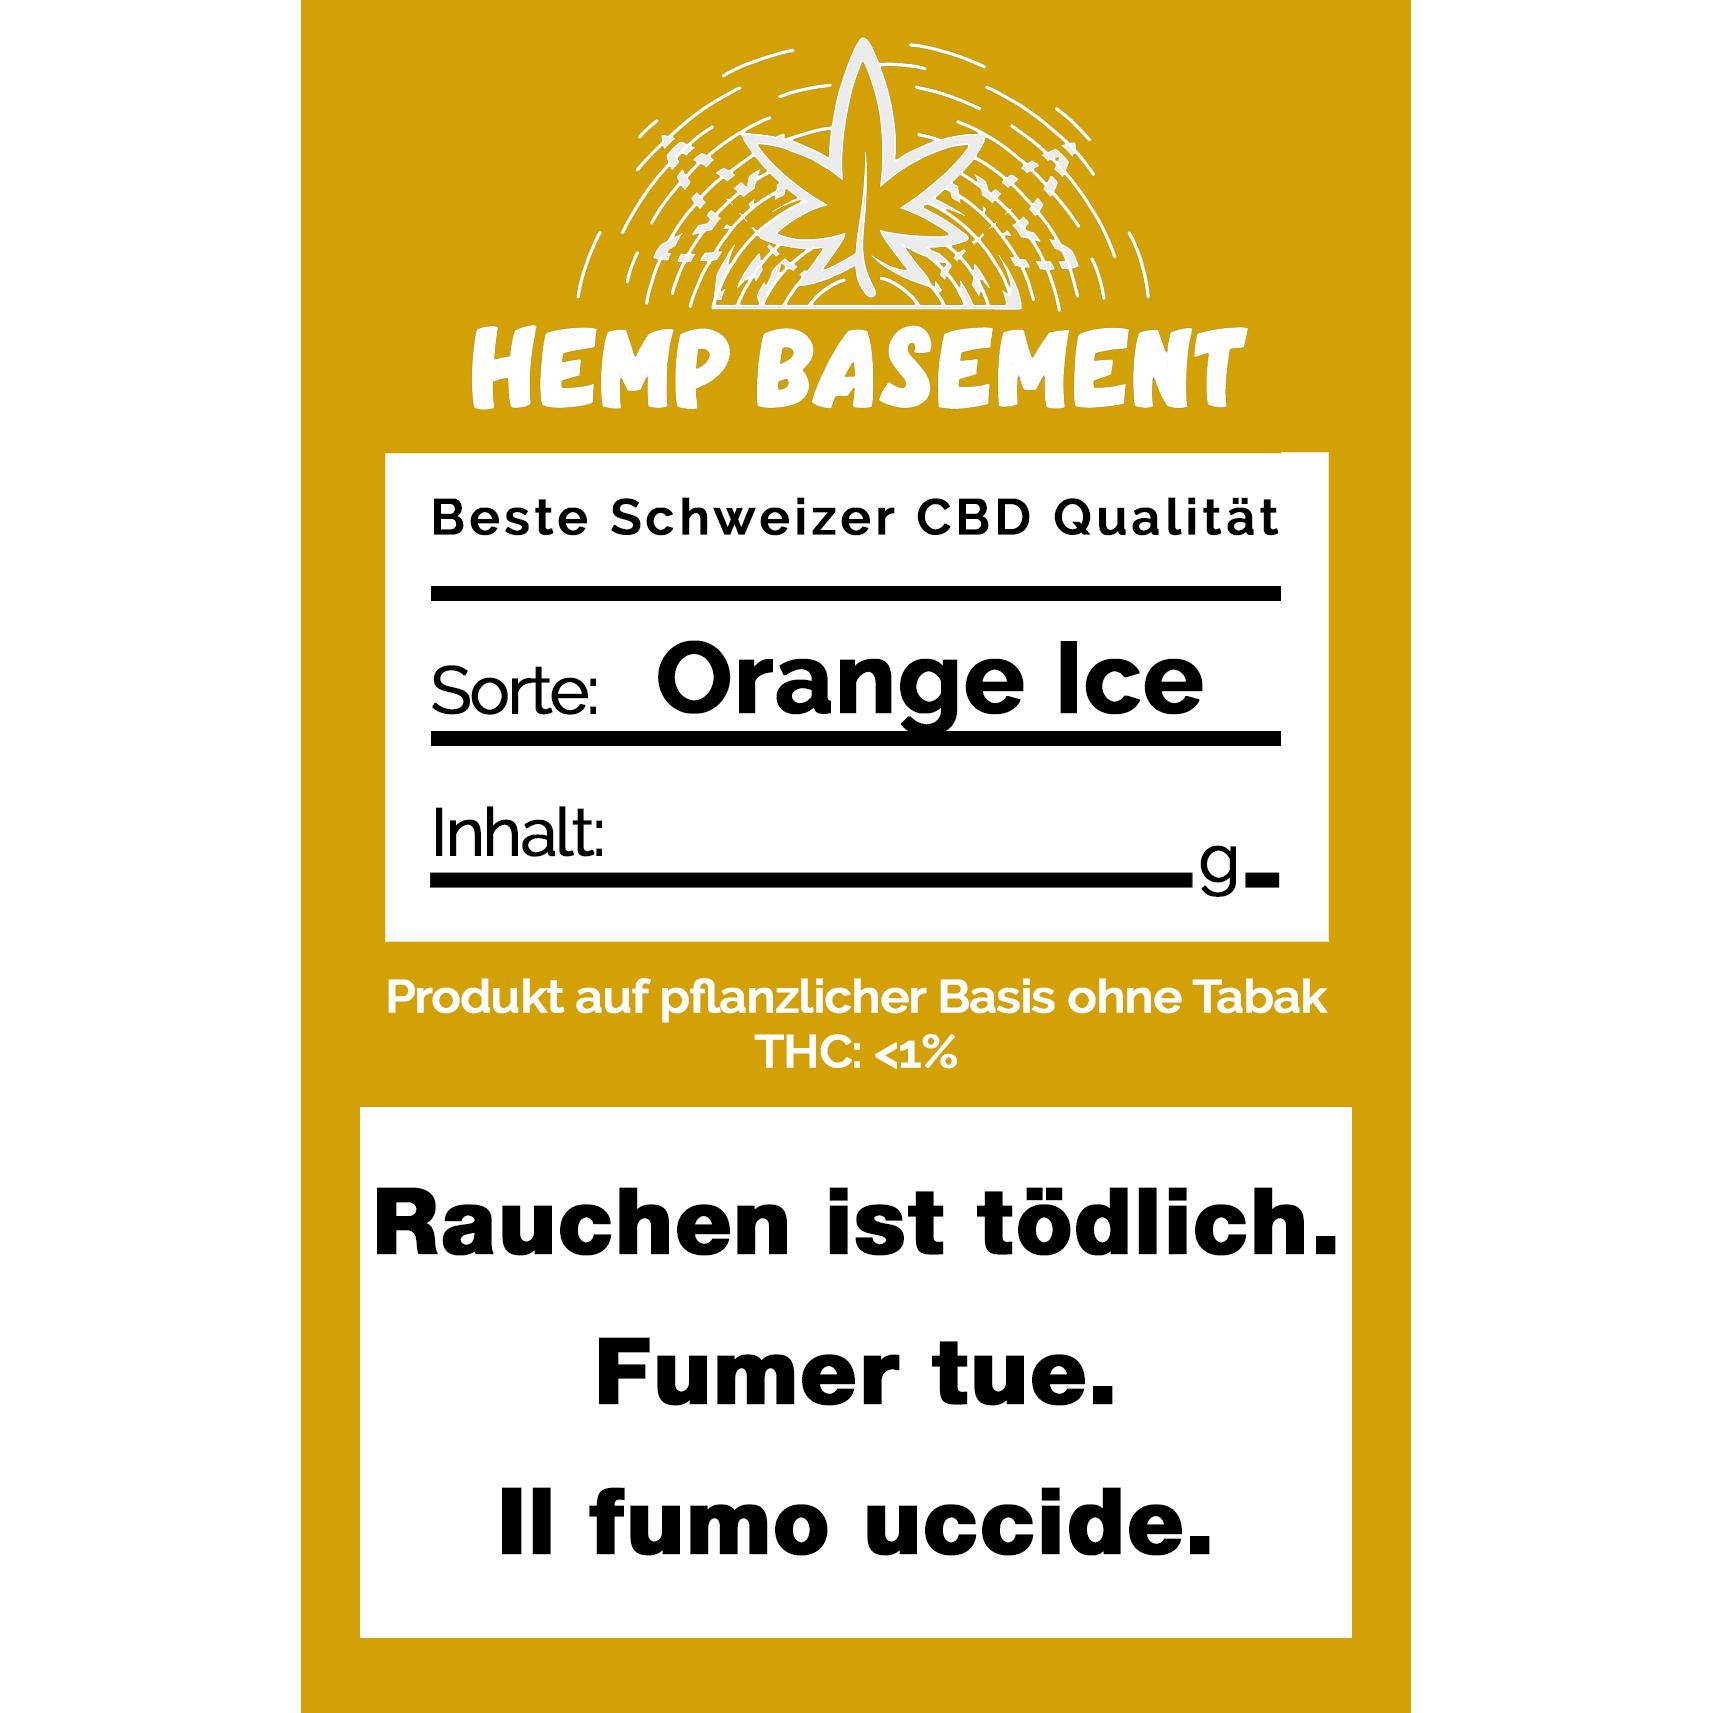 Hemp Basement Orange Ice CBD kaufen online